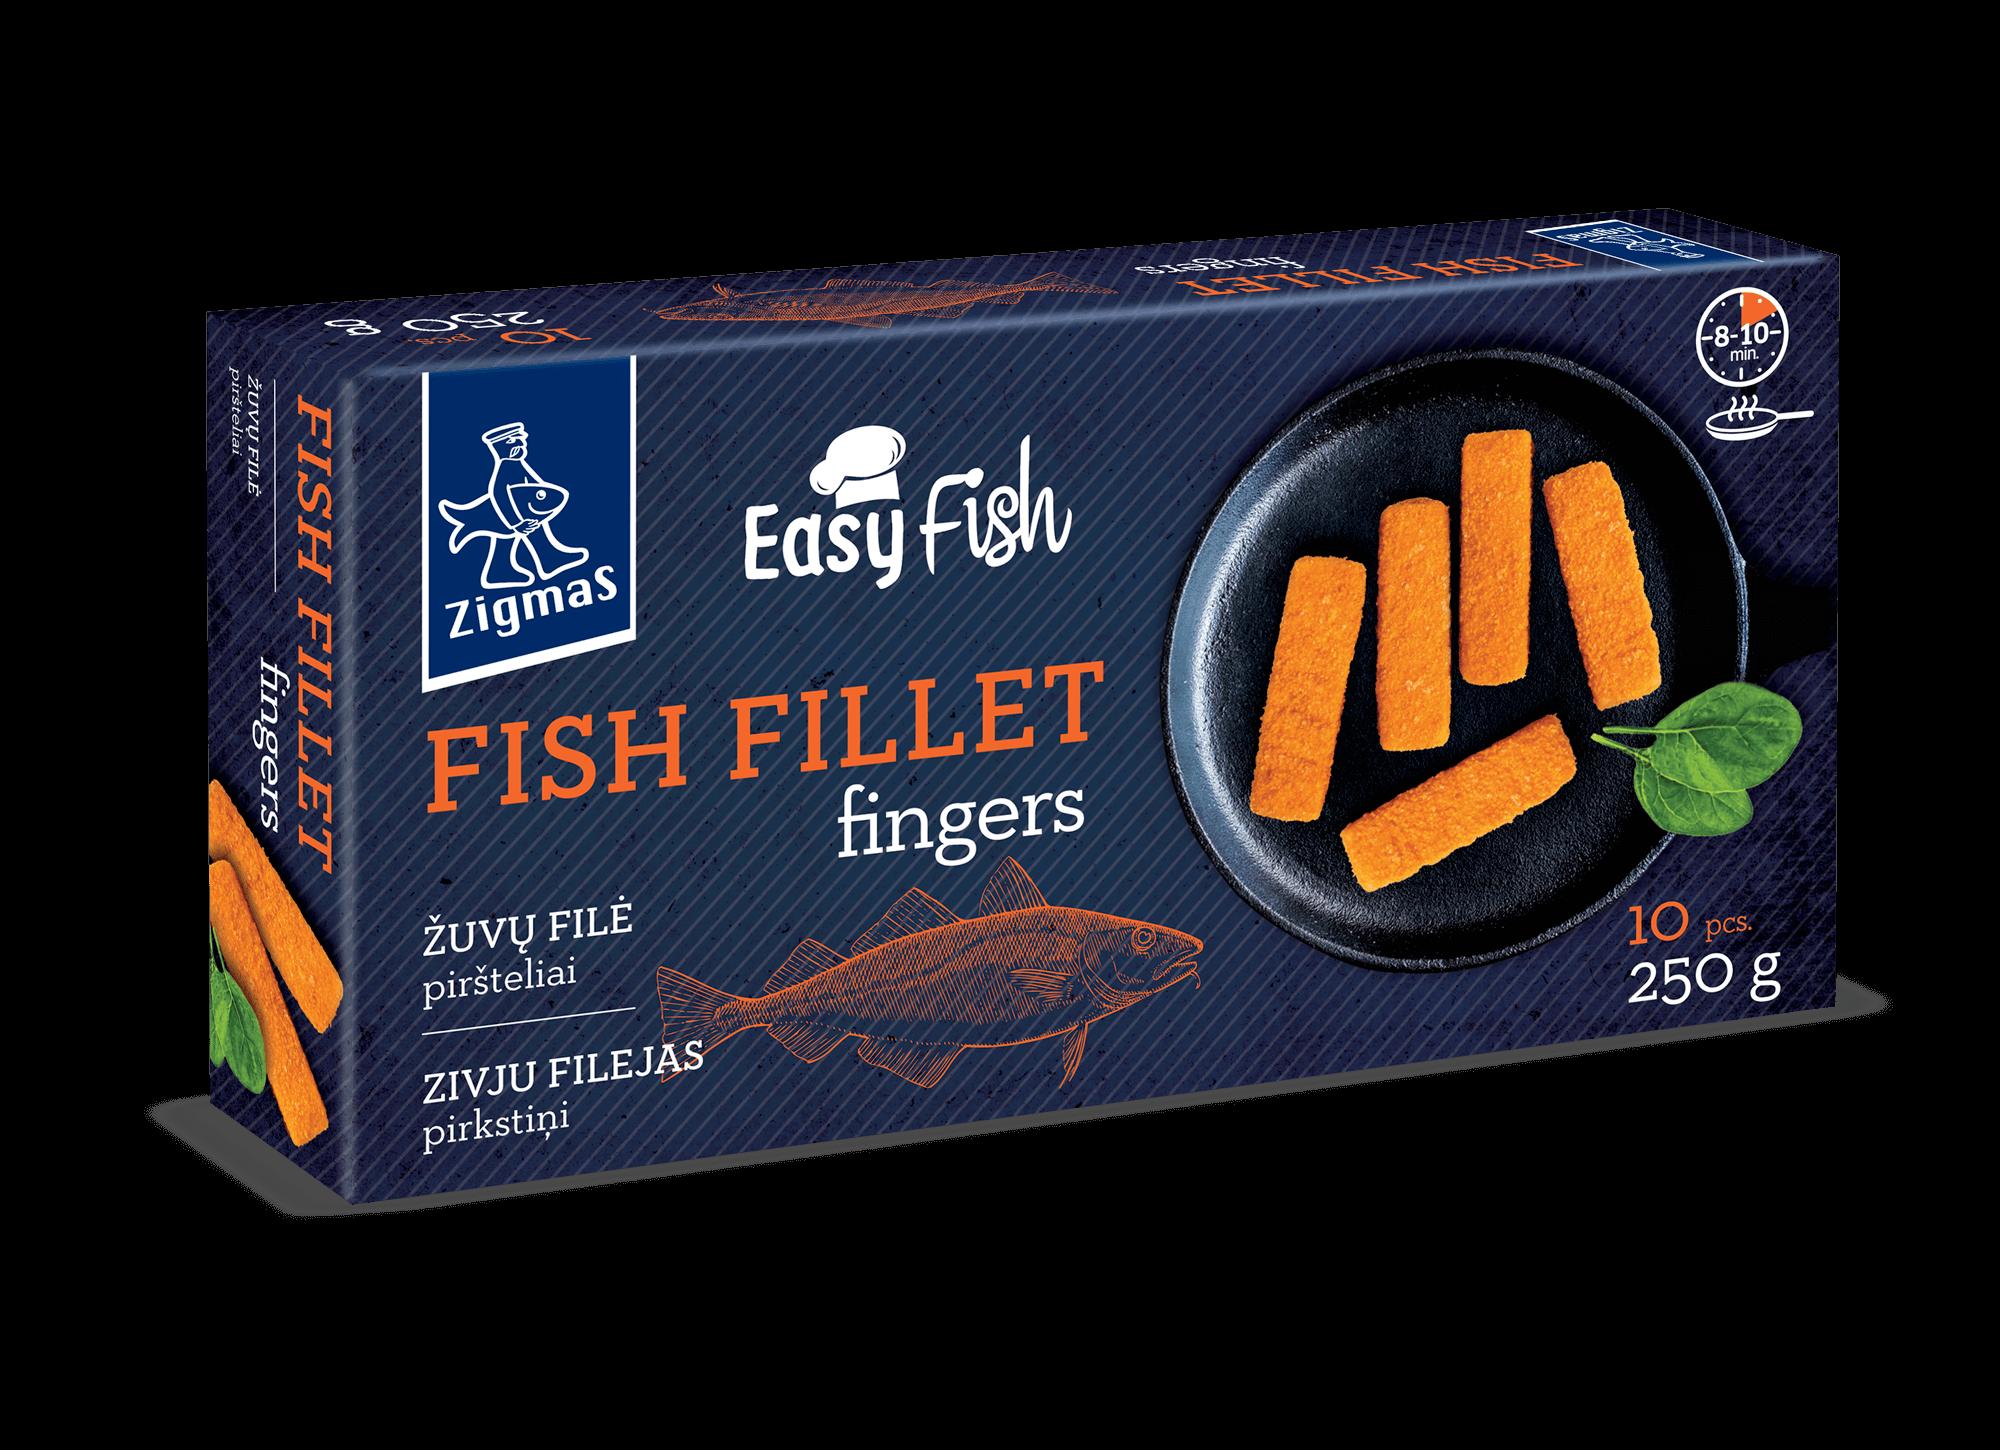 Fish fillet fingers